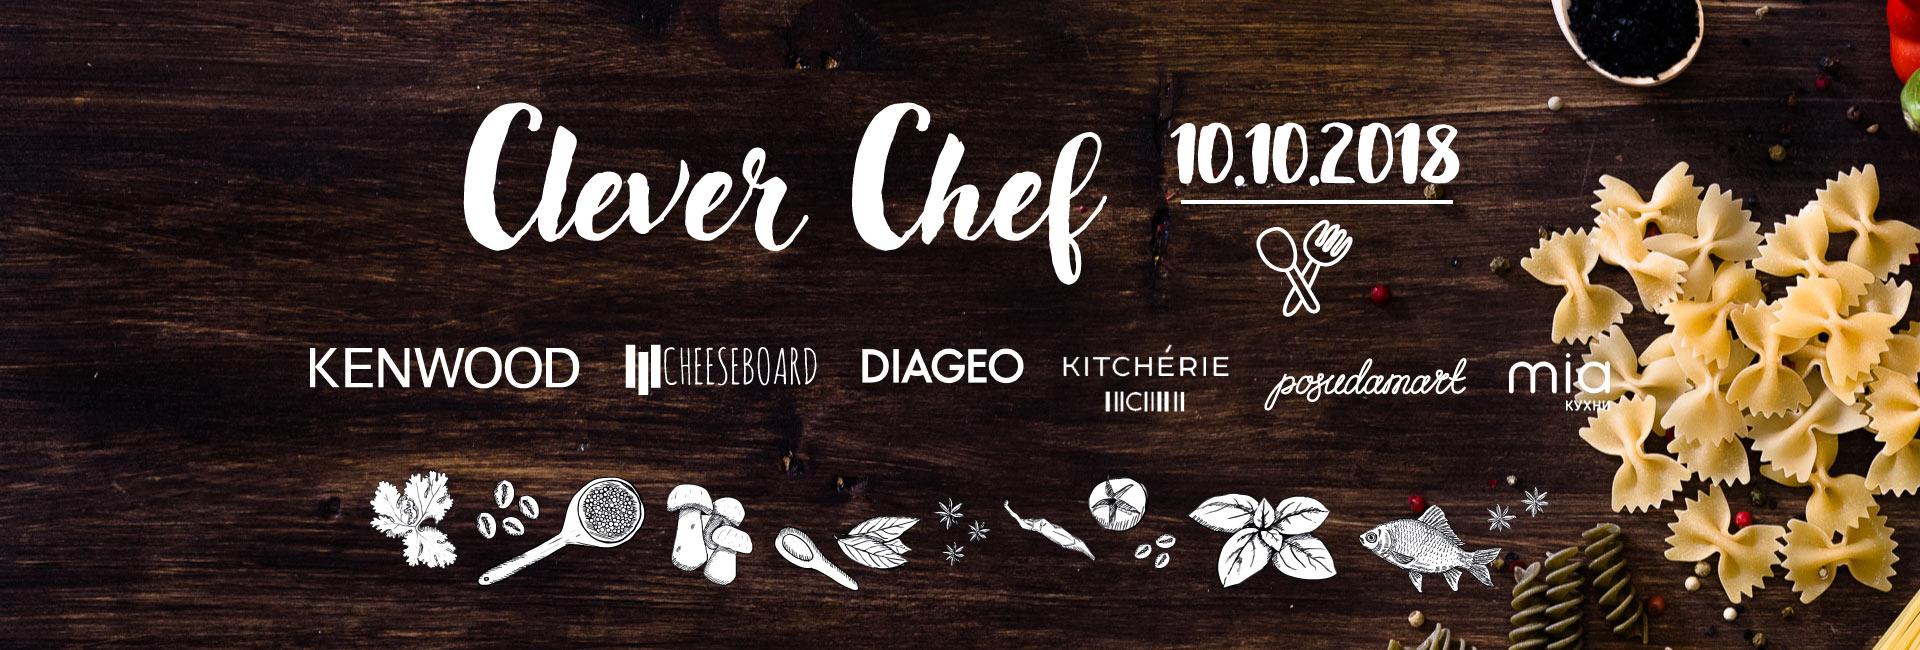 Кулинарный поединок Clever Chef 2018